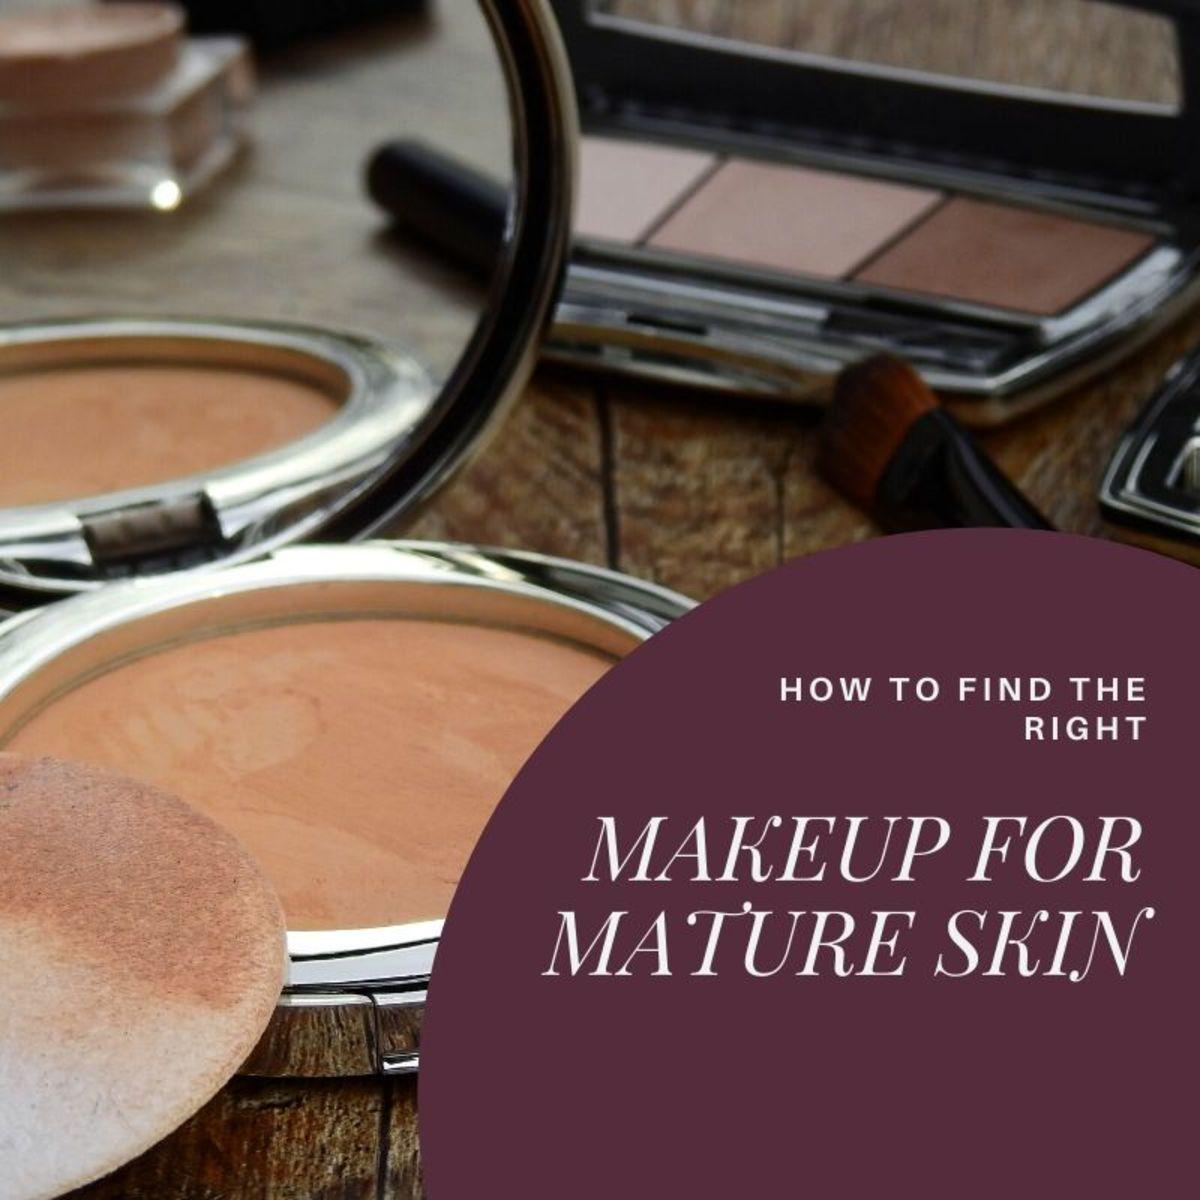 Best Makeup for Mature Skin